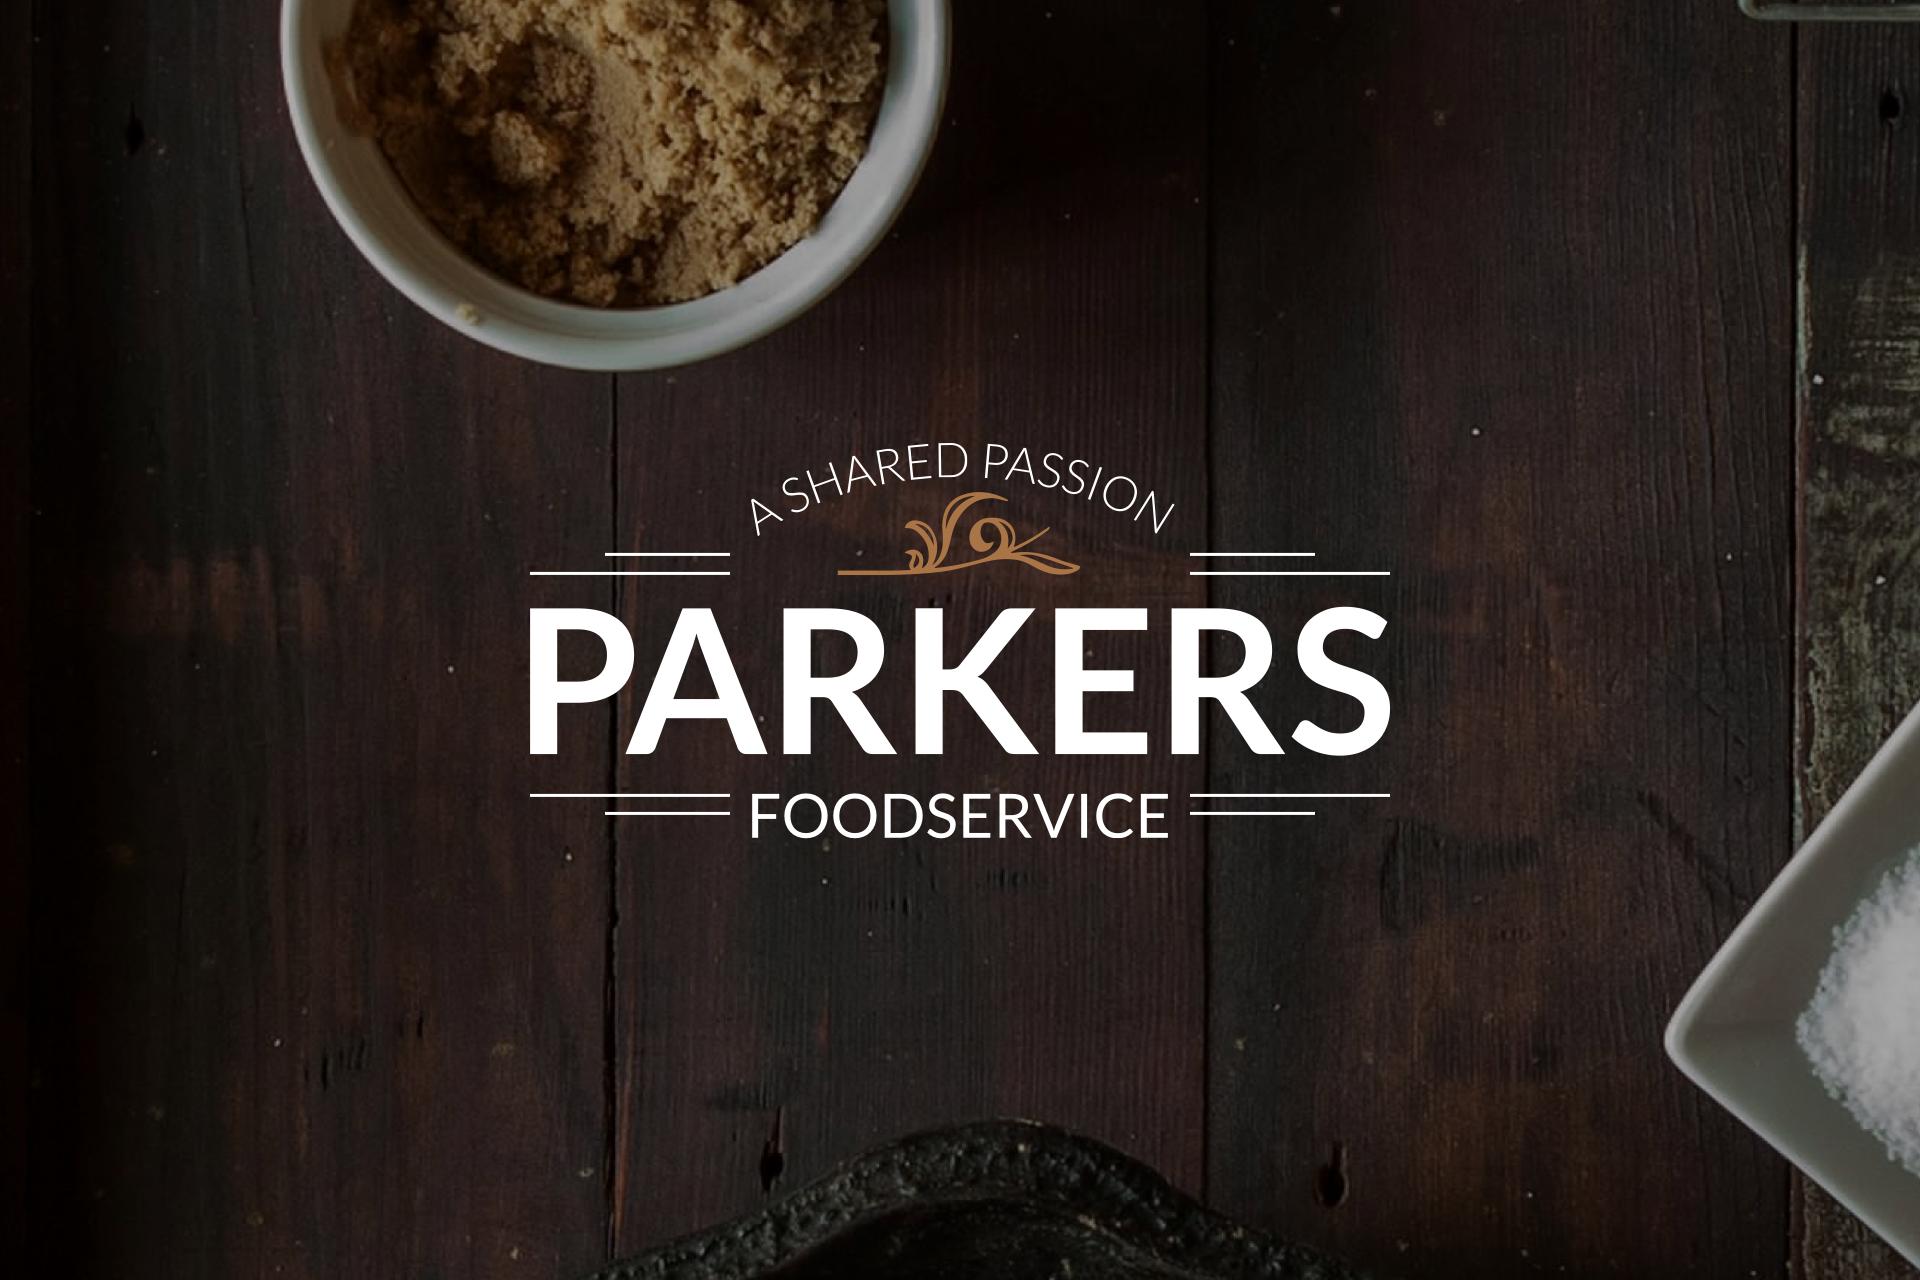 Parkers_Foodservice.jpeg